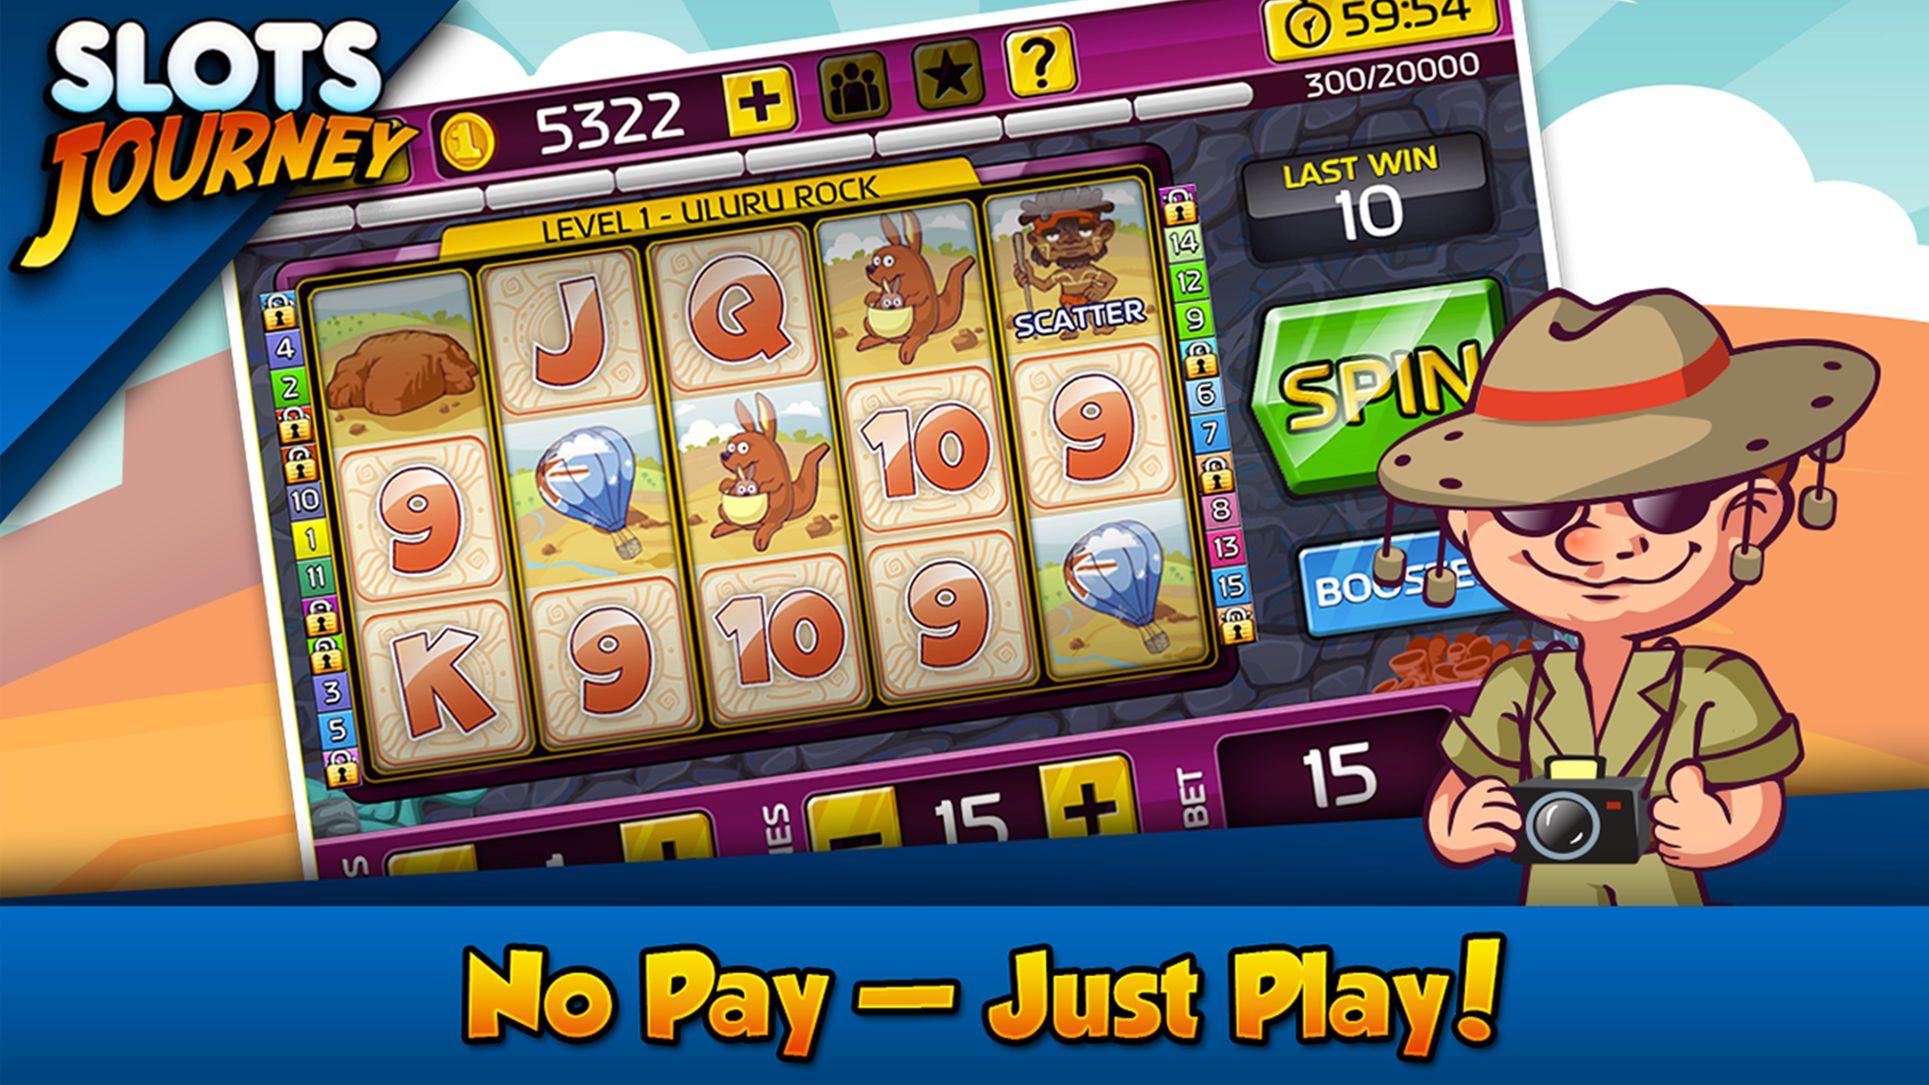 Slots Journey Games